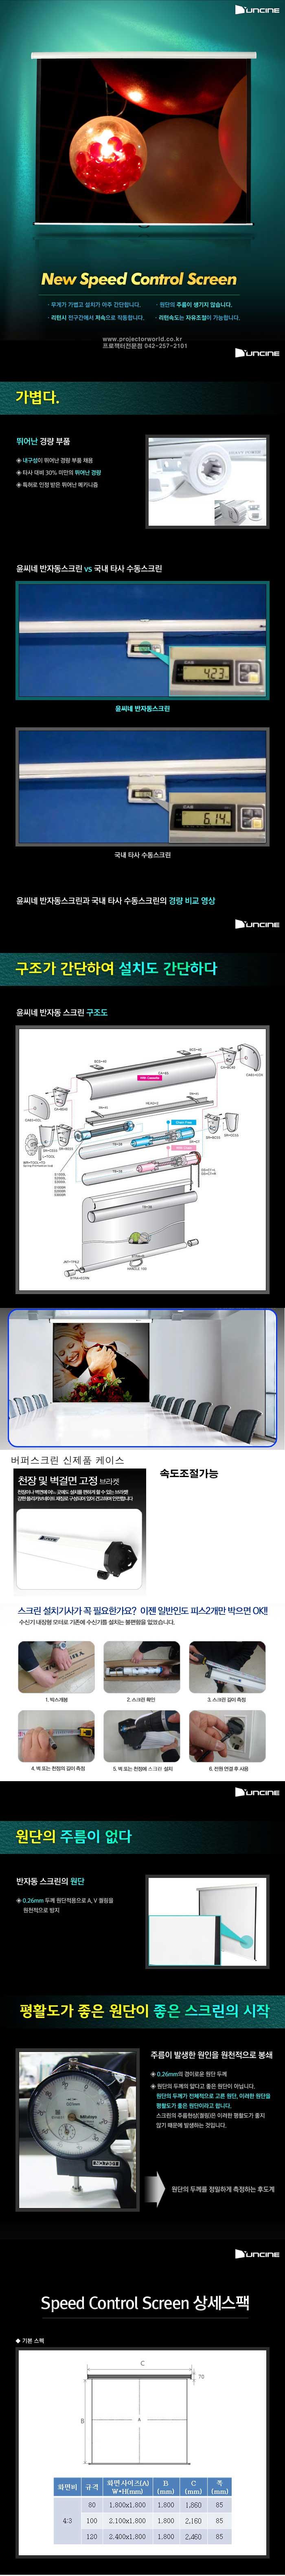 BUFFER-Screen,버퍼스크린,반자동스크린이미지,전문점스크린,